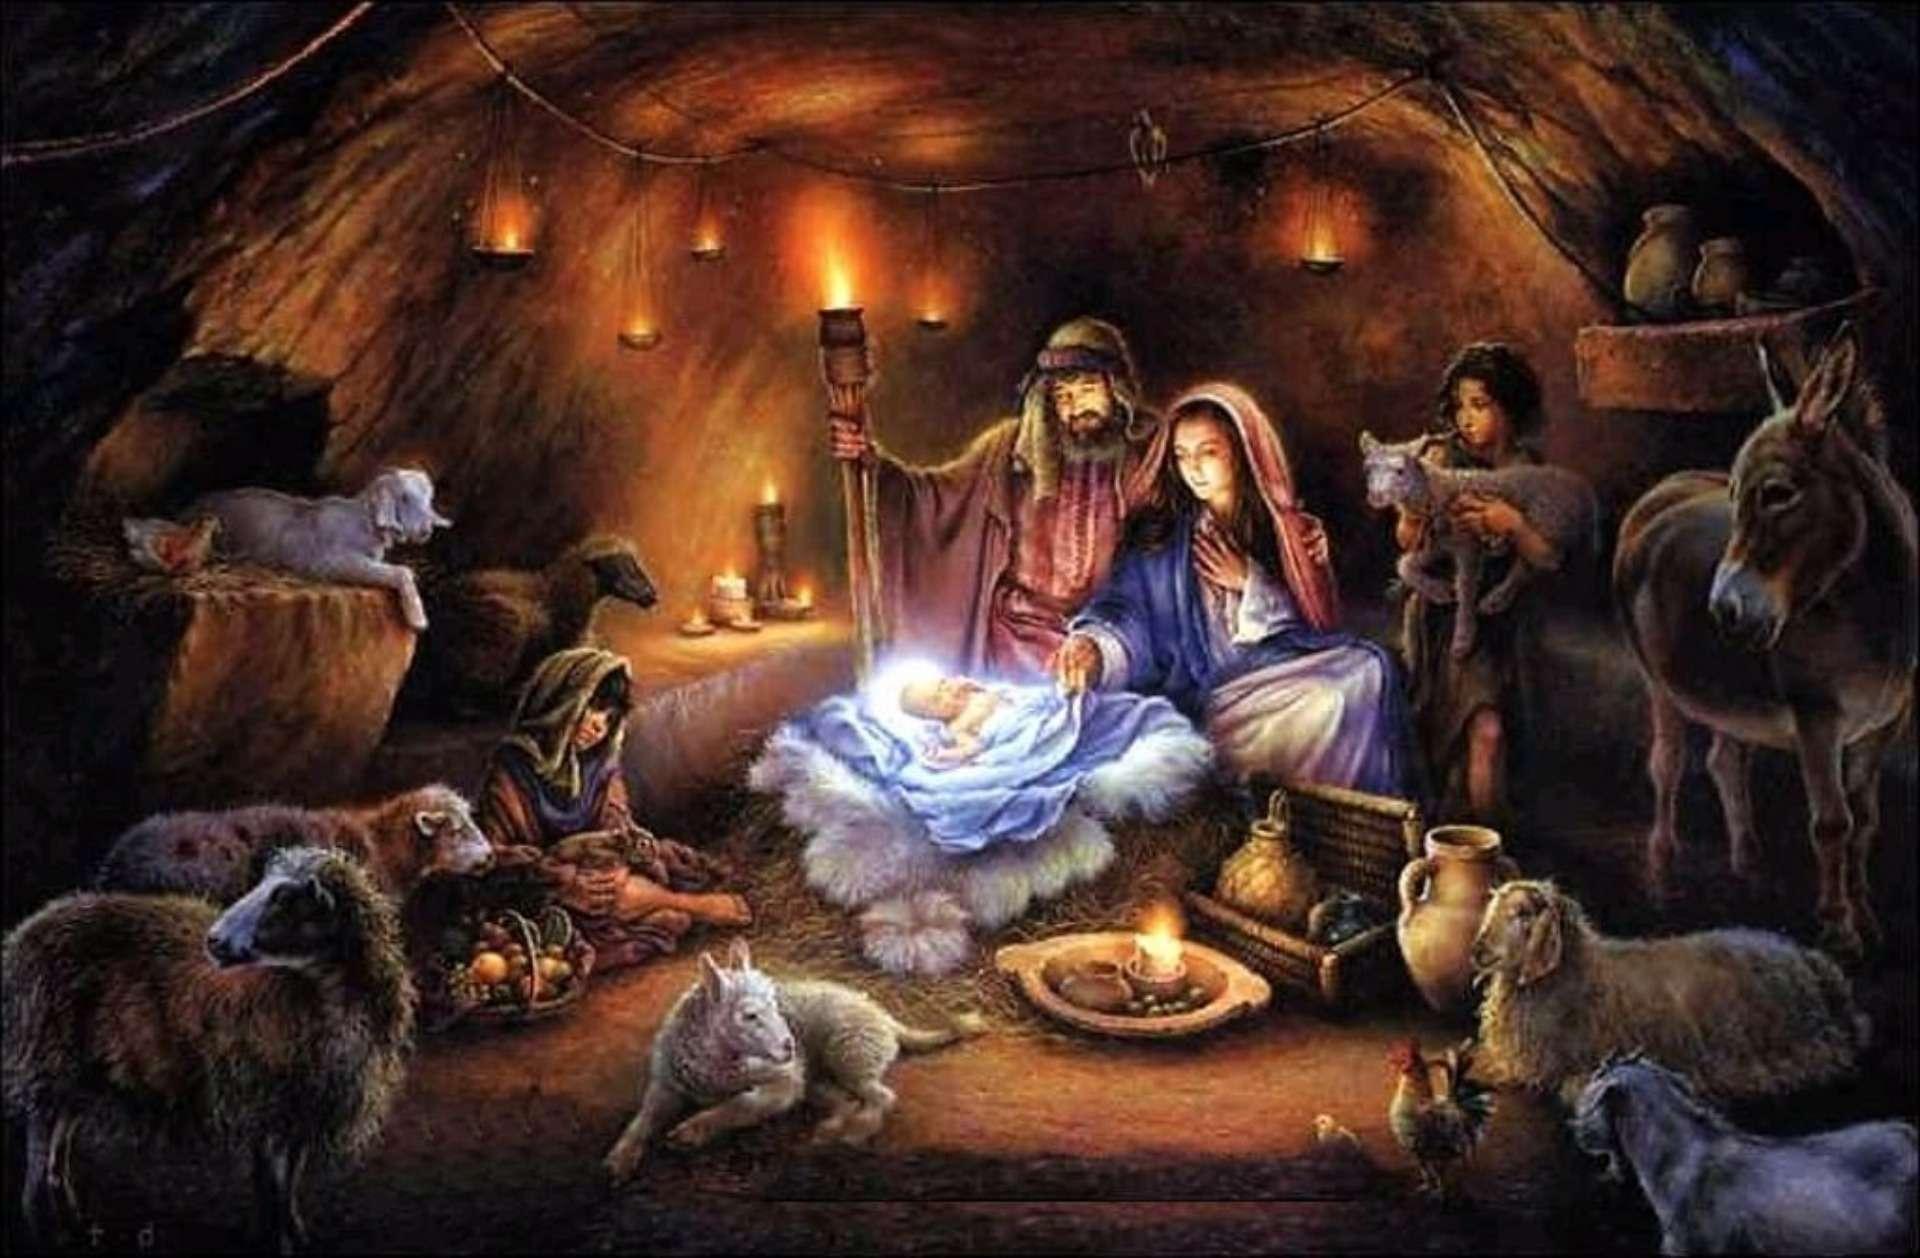 bible-study-the-birth-of-jesus-christ-matthew-1-18-25